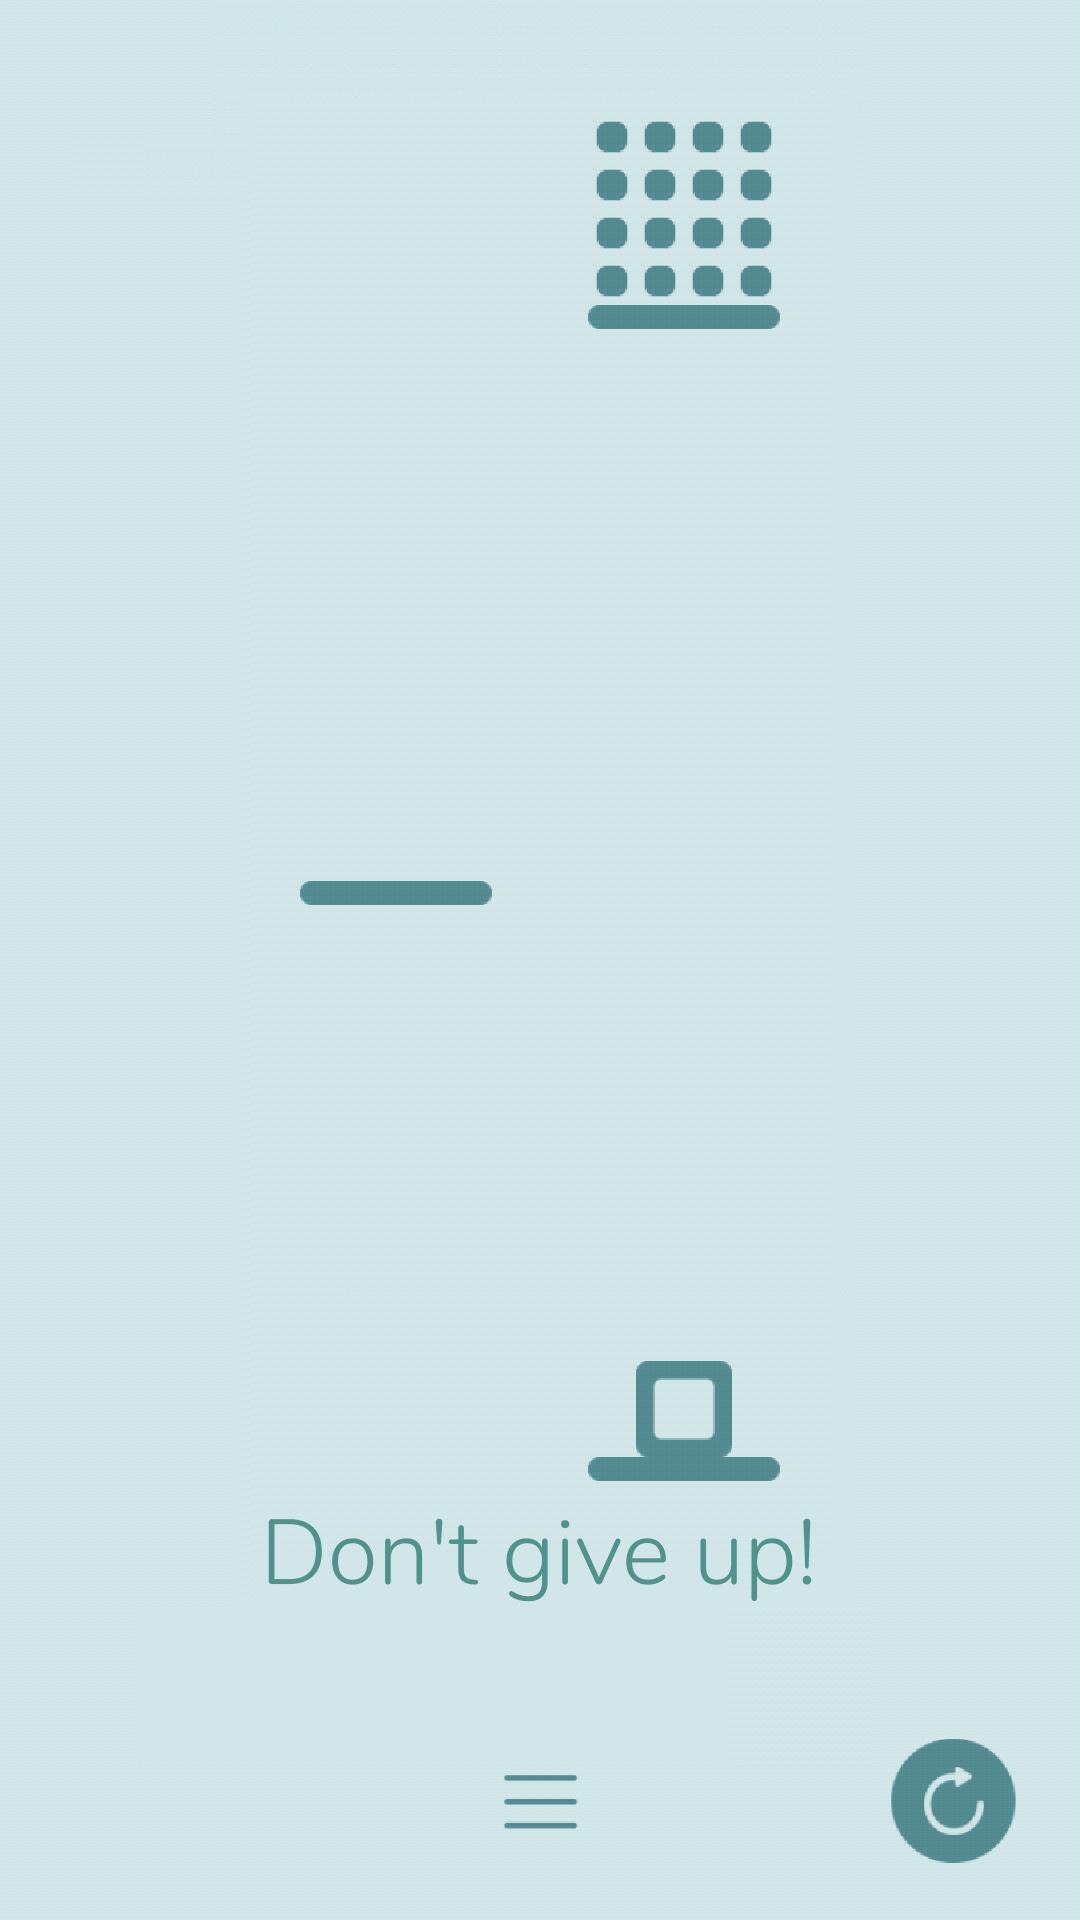 Gravity Box Minimalist Physics Game 1.5 Screenshot 6